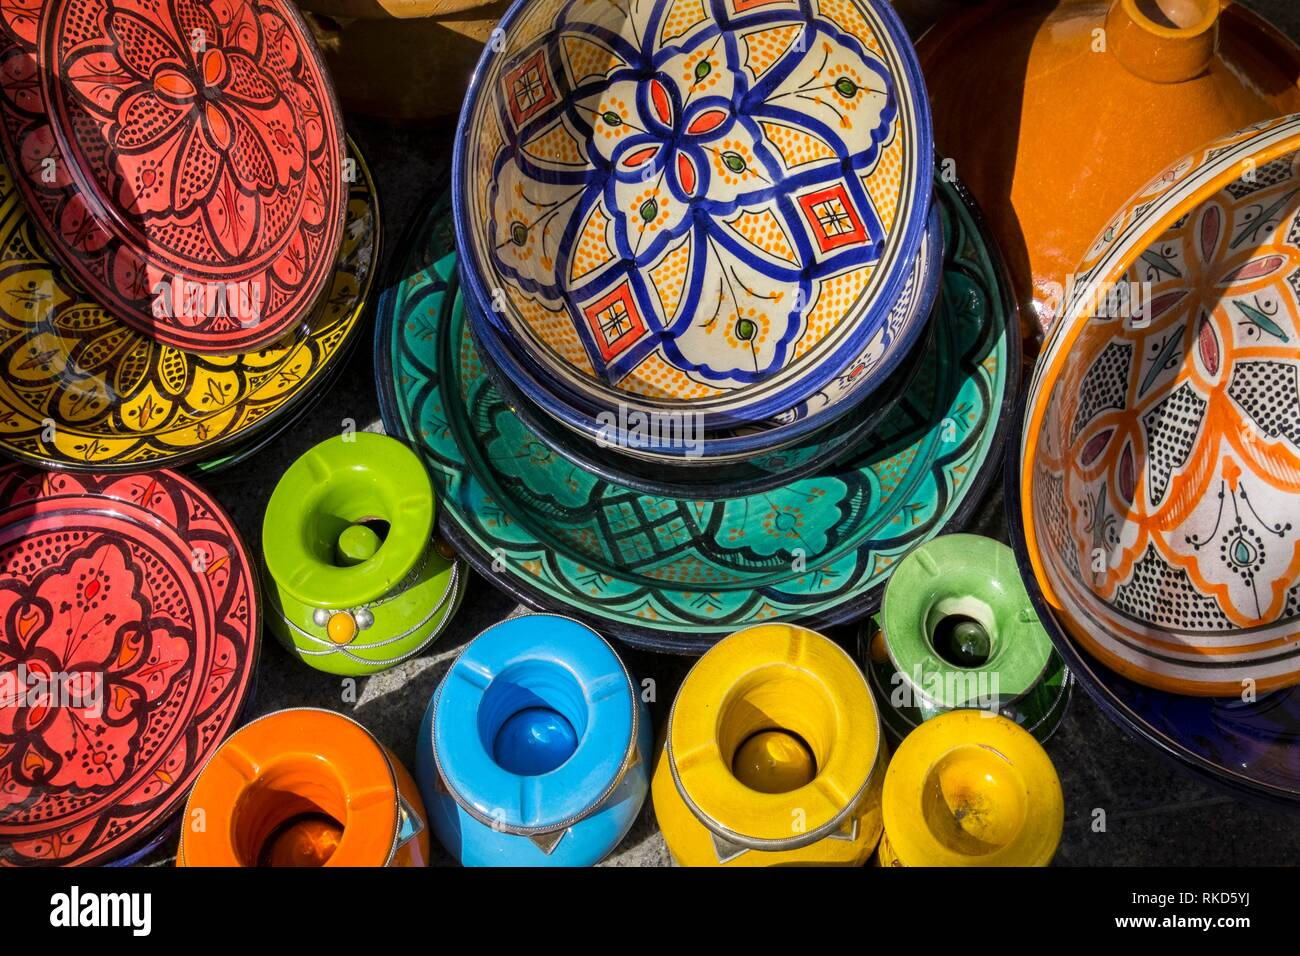 Morocco, Handicraft, typical ceramics. - Stock Image